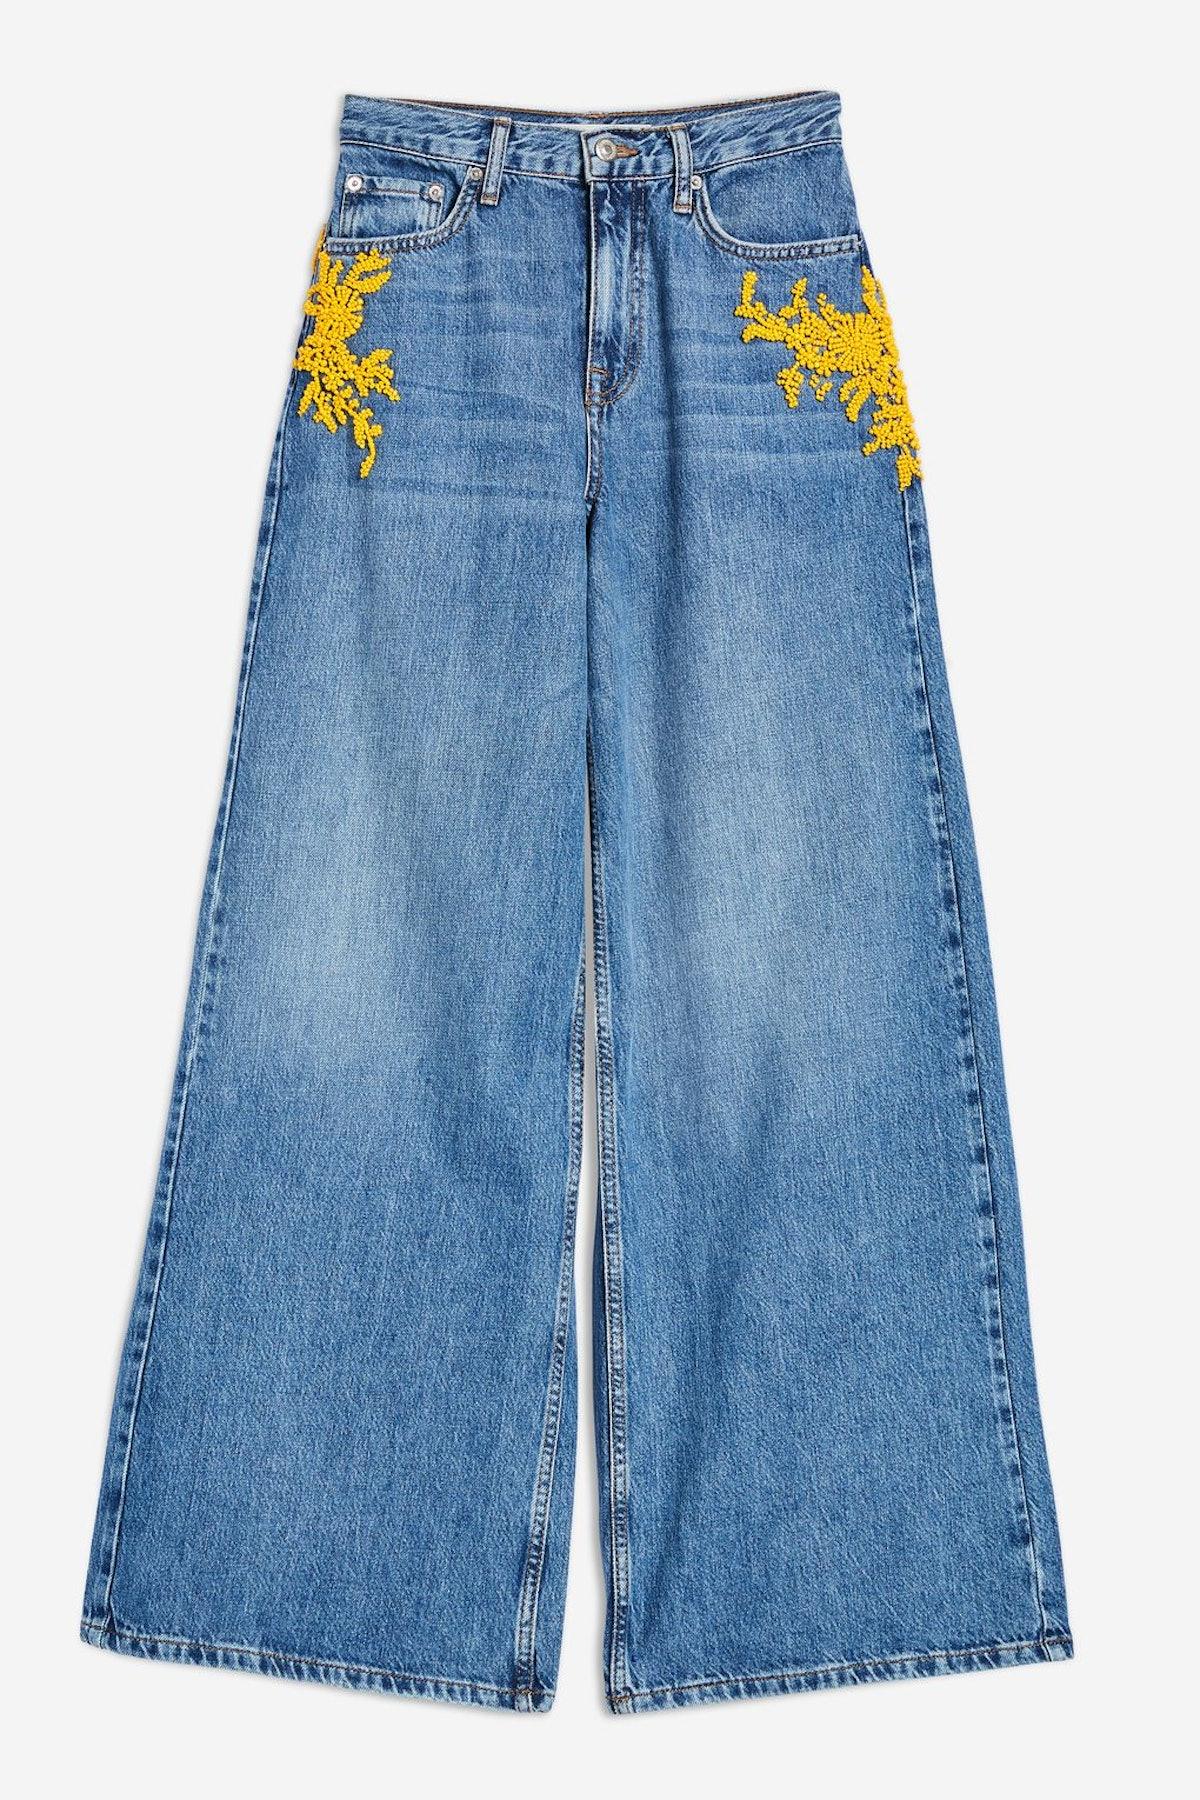 MOTO Yellow Bead Wide Leg Jeans